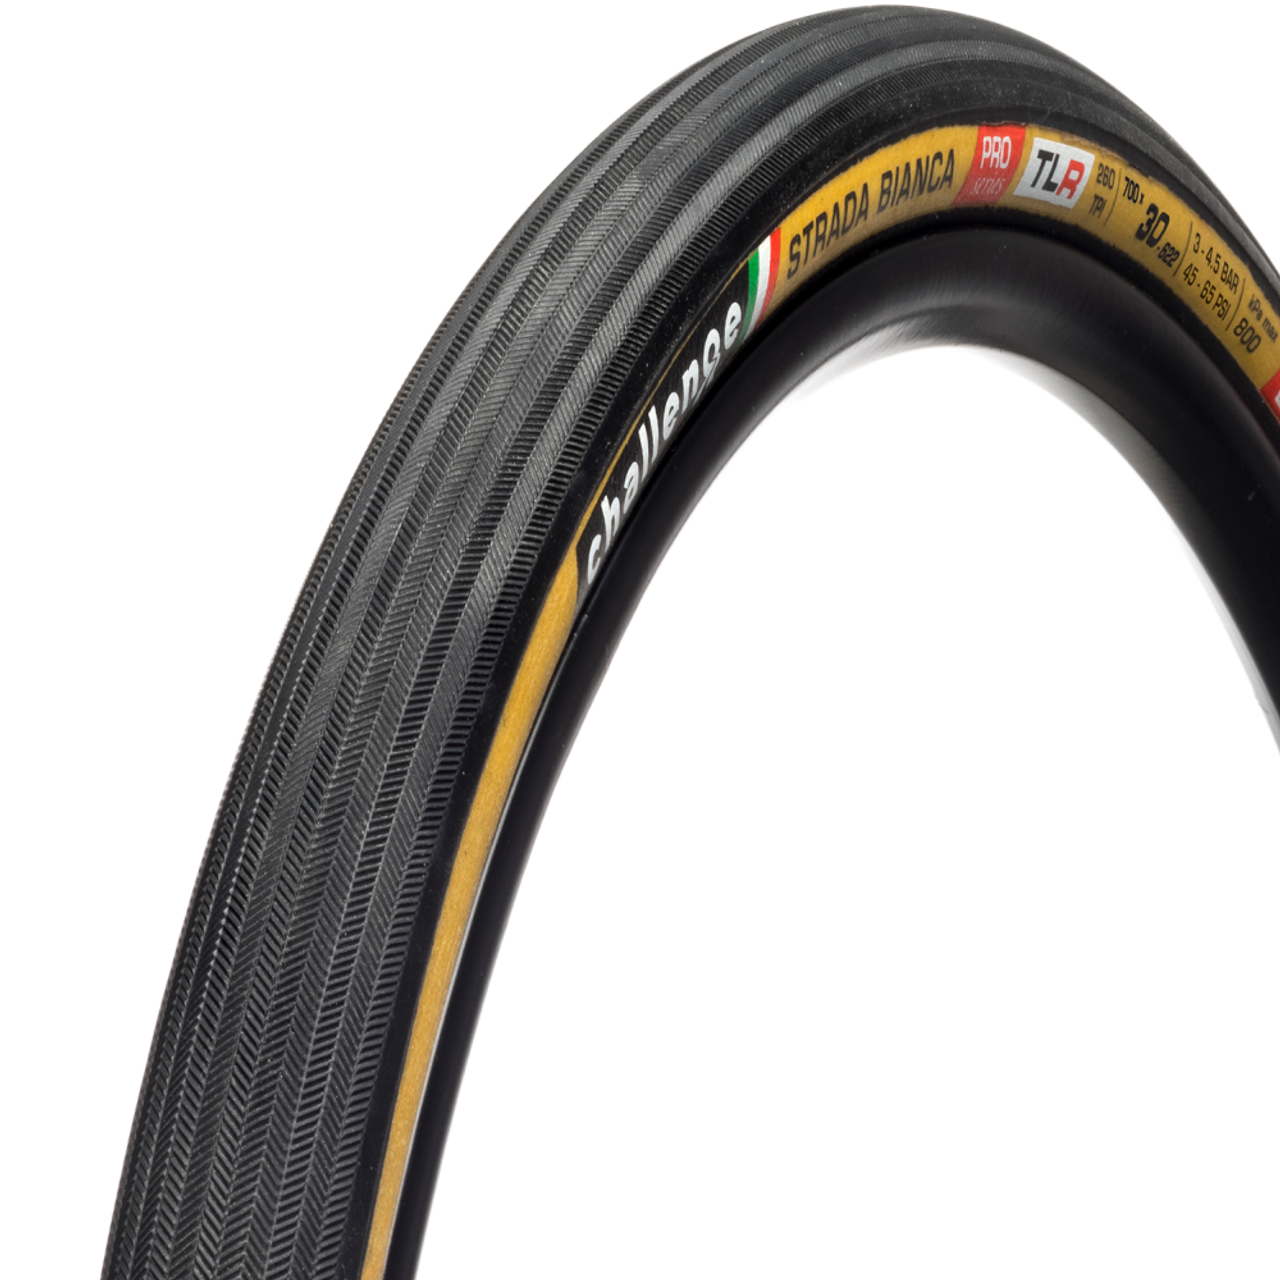 Challenge Strada Bianca Pro Tubeless Ready Cyclocross/Gravel Tyre- Tan 700 x 30